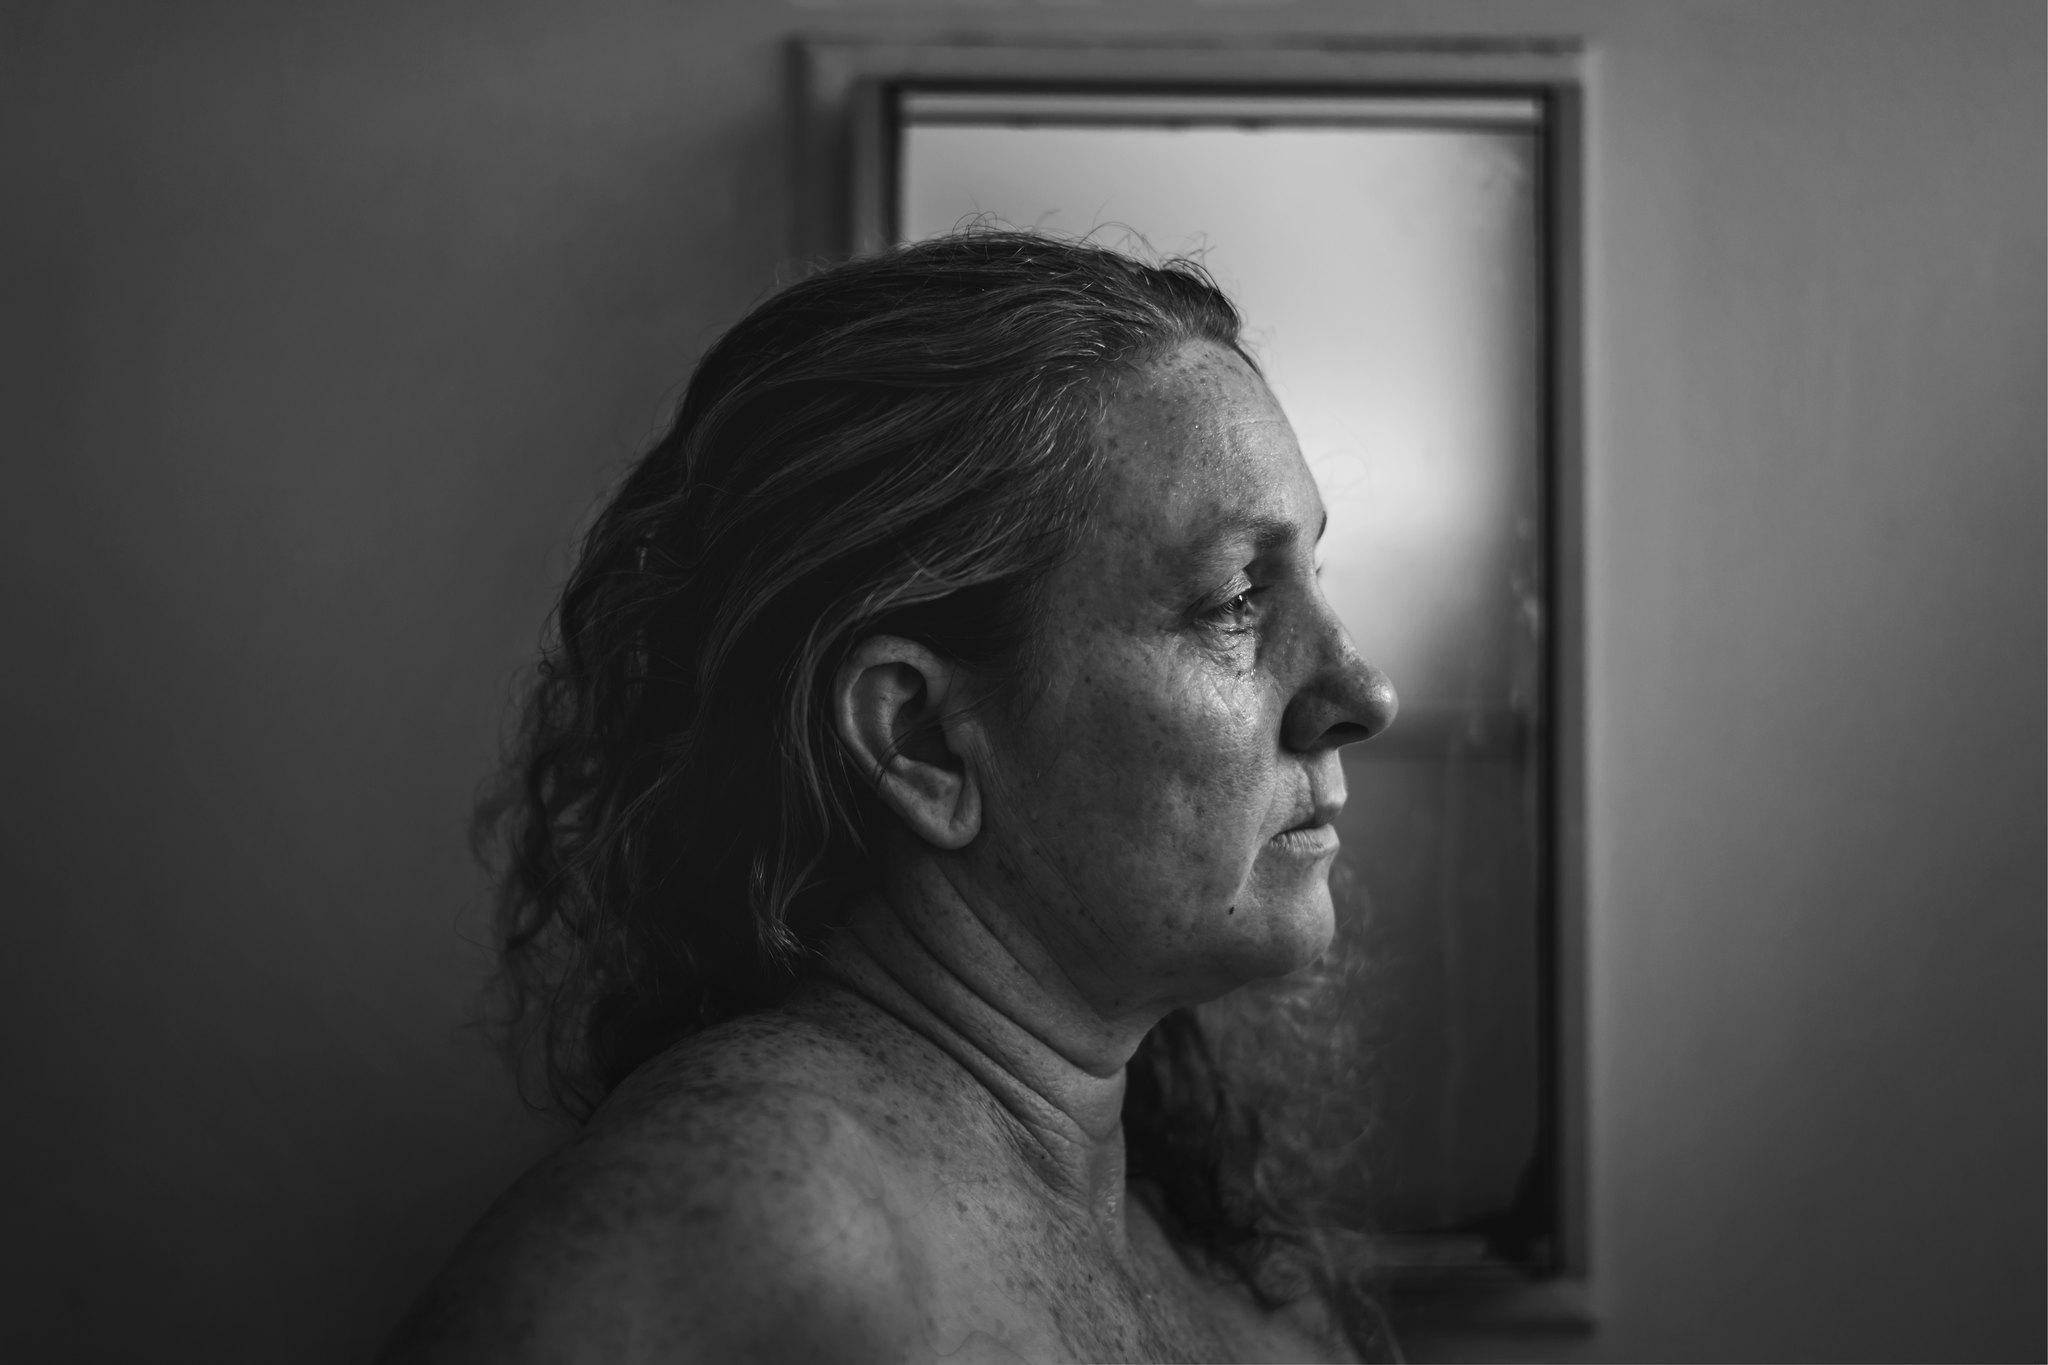 Self portrait in front of mirror by Katy Bindels